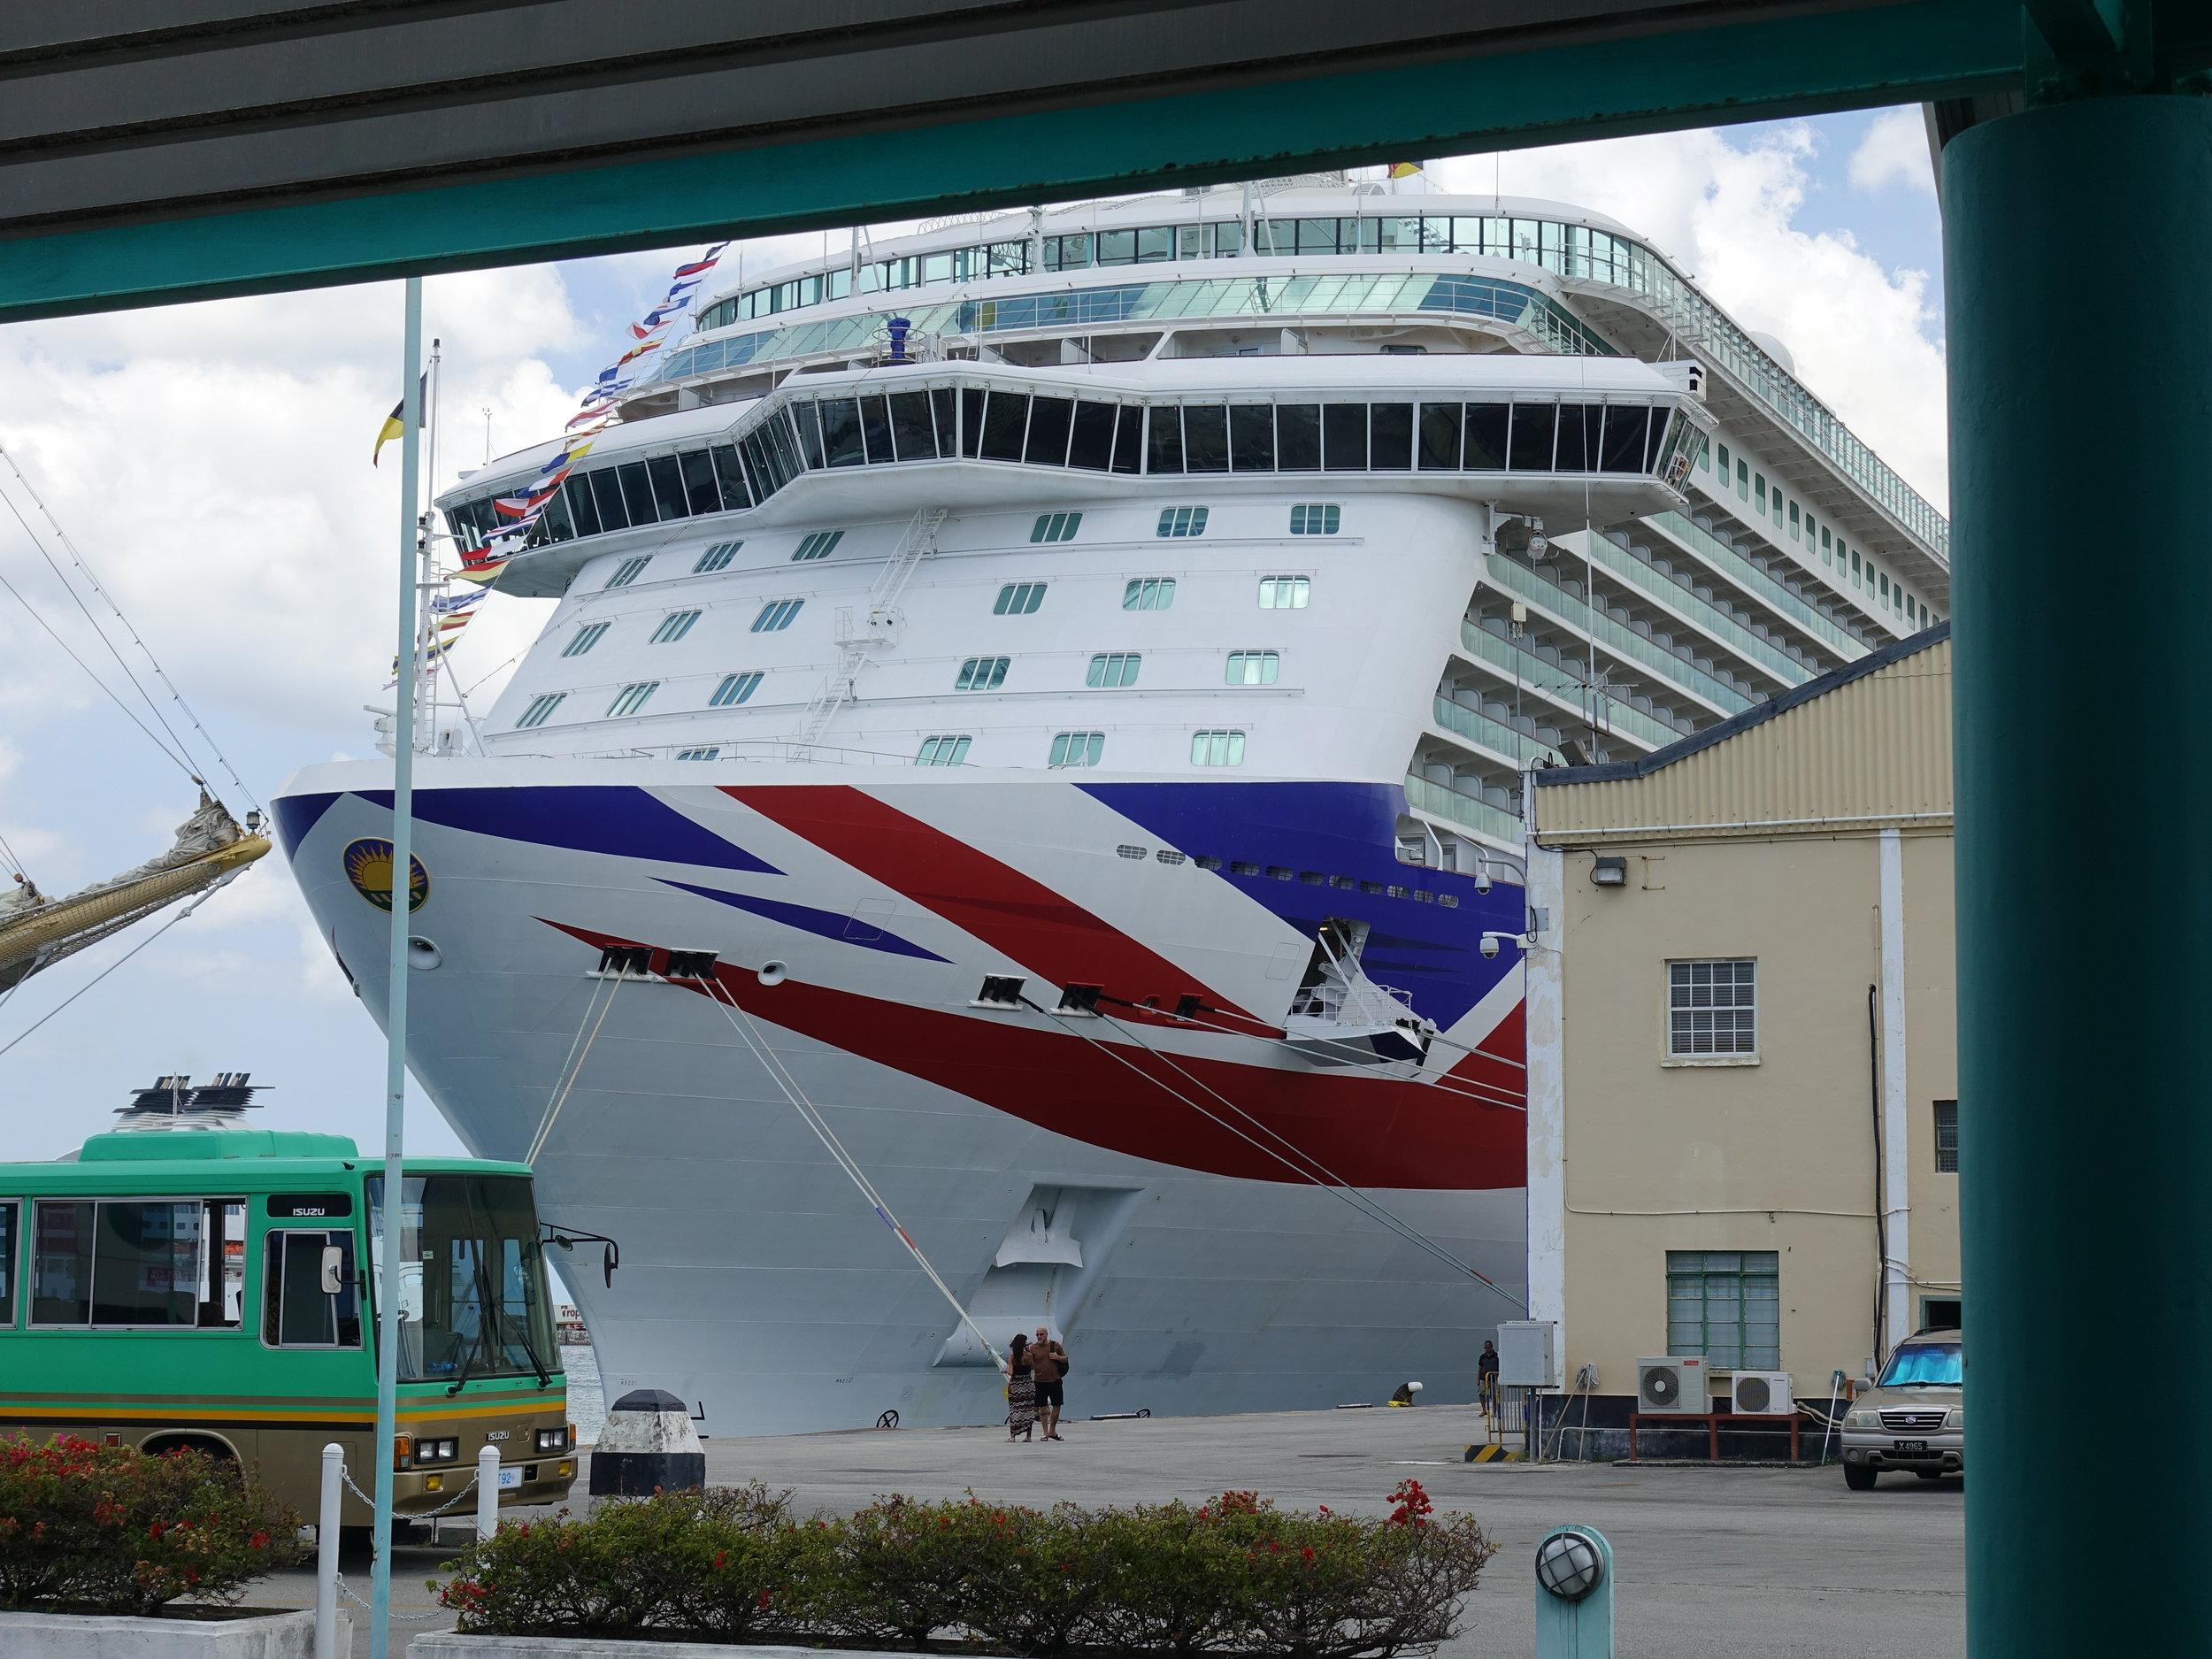 P&O Britannia dwarfing the port buildings in Barbados.